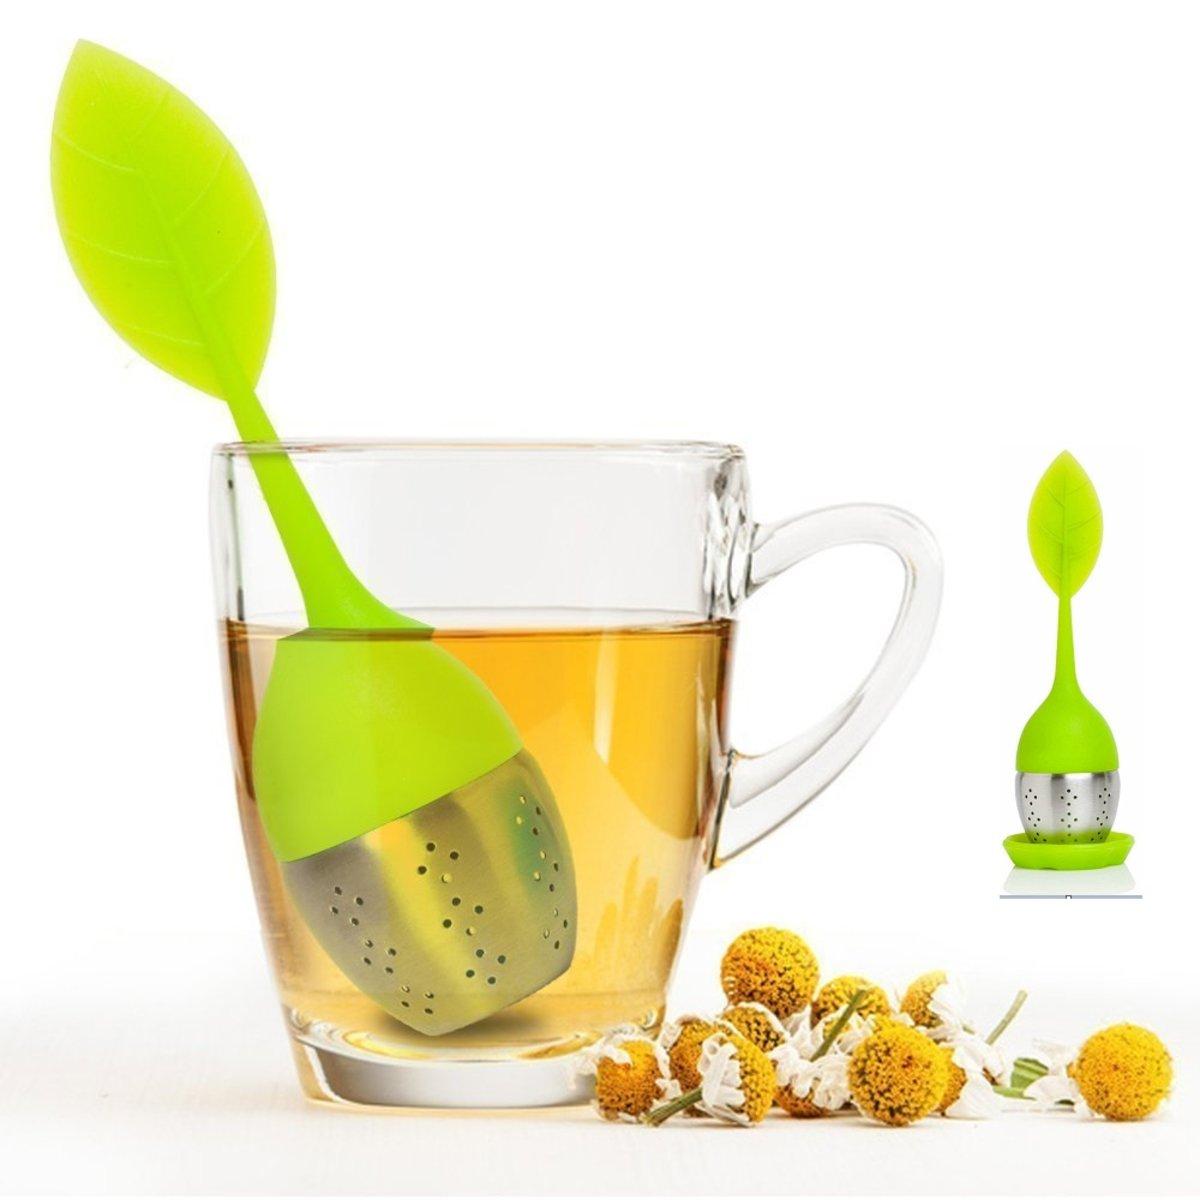 Set of 1 Tea Infuser Leaf Strainer Handle with Steel Ball Silicone Leaf Lid (Green)